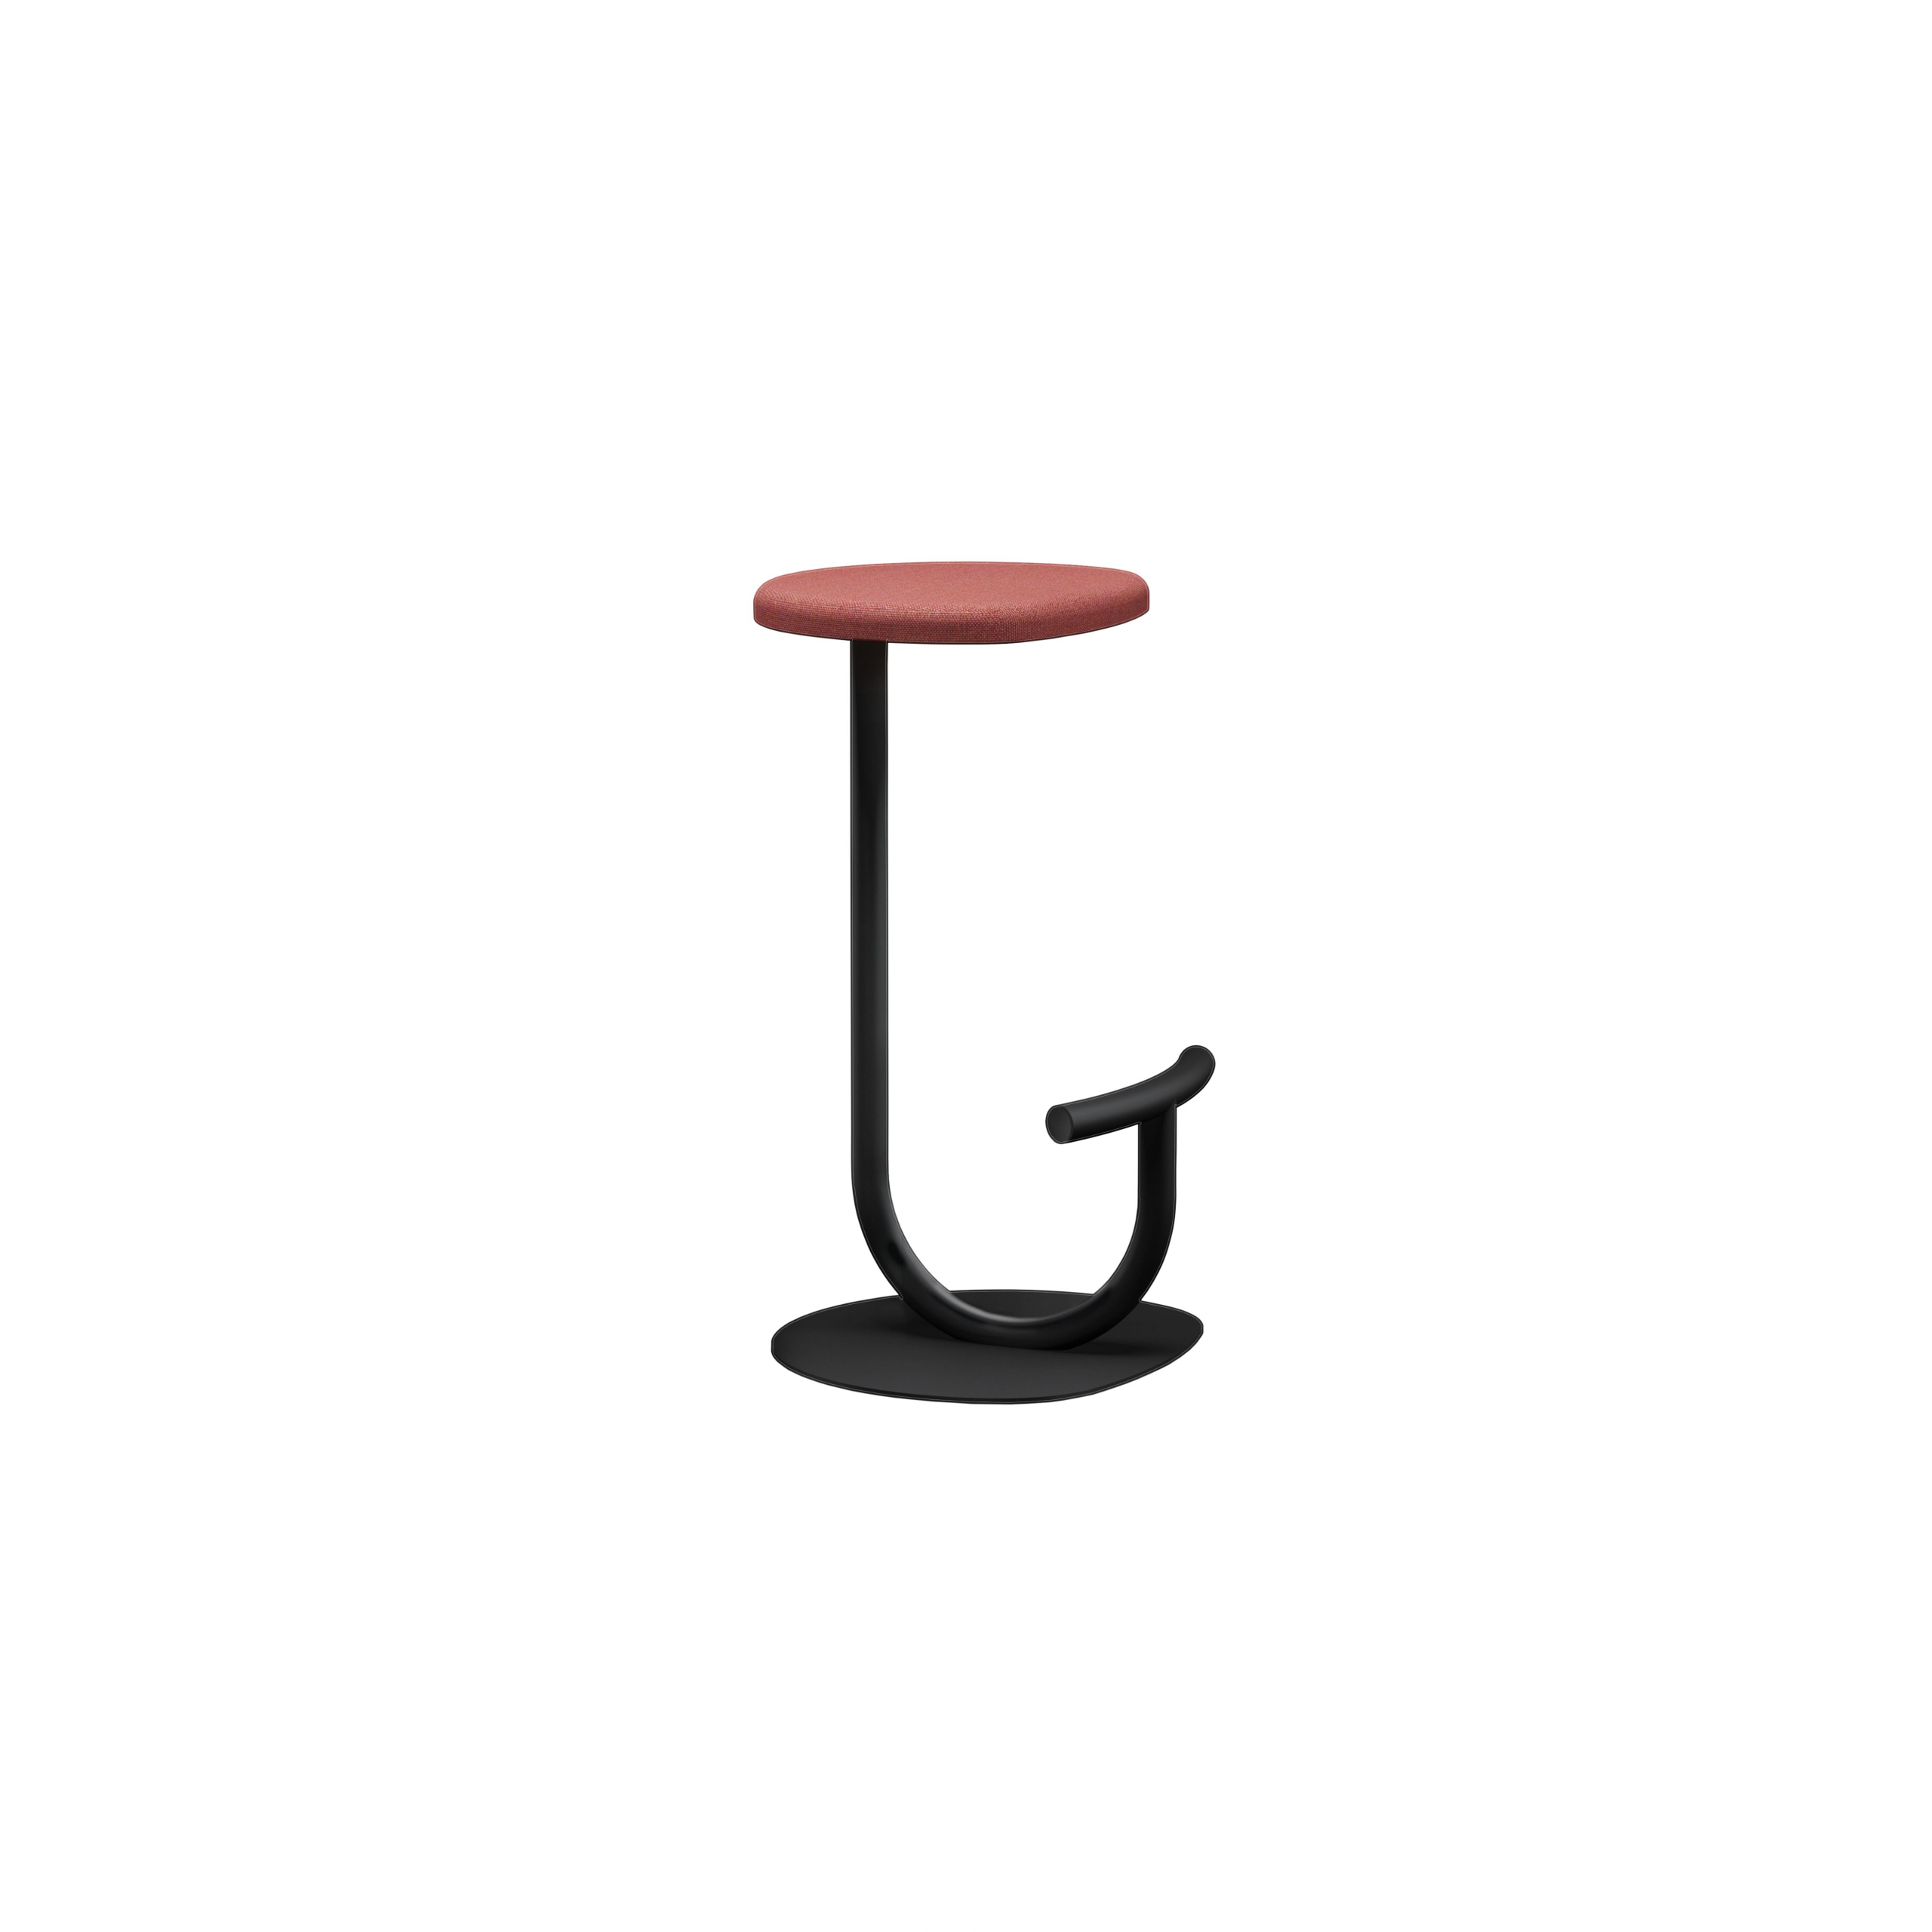 Ride Bar stool product image 1